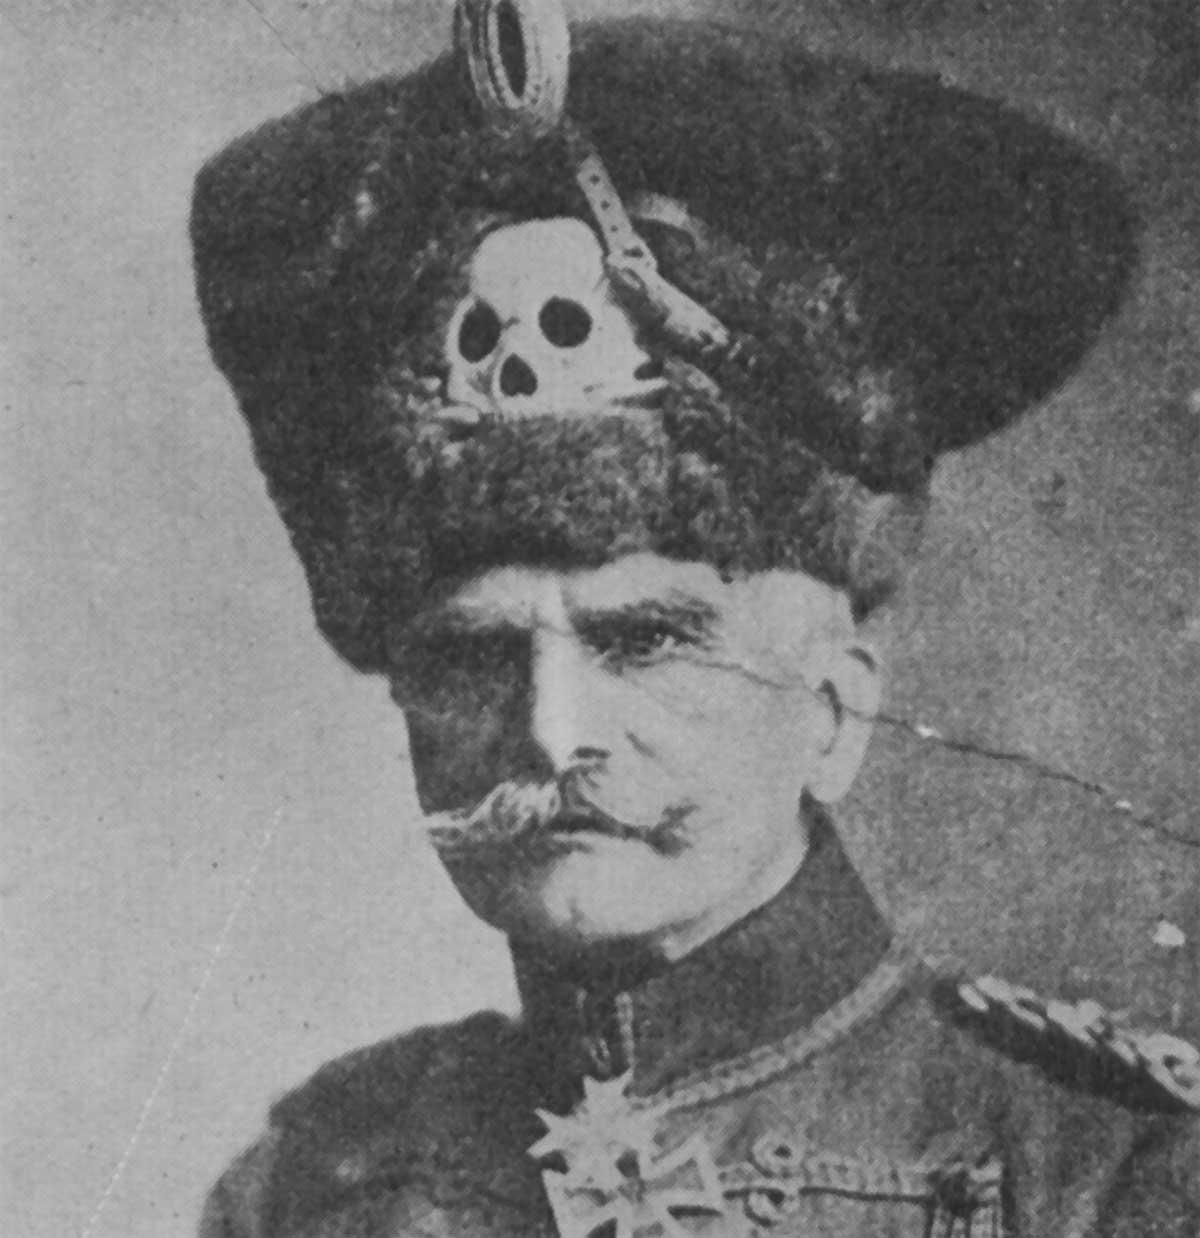 биография генерала корнилова: